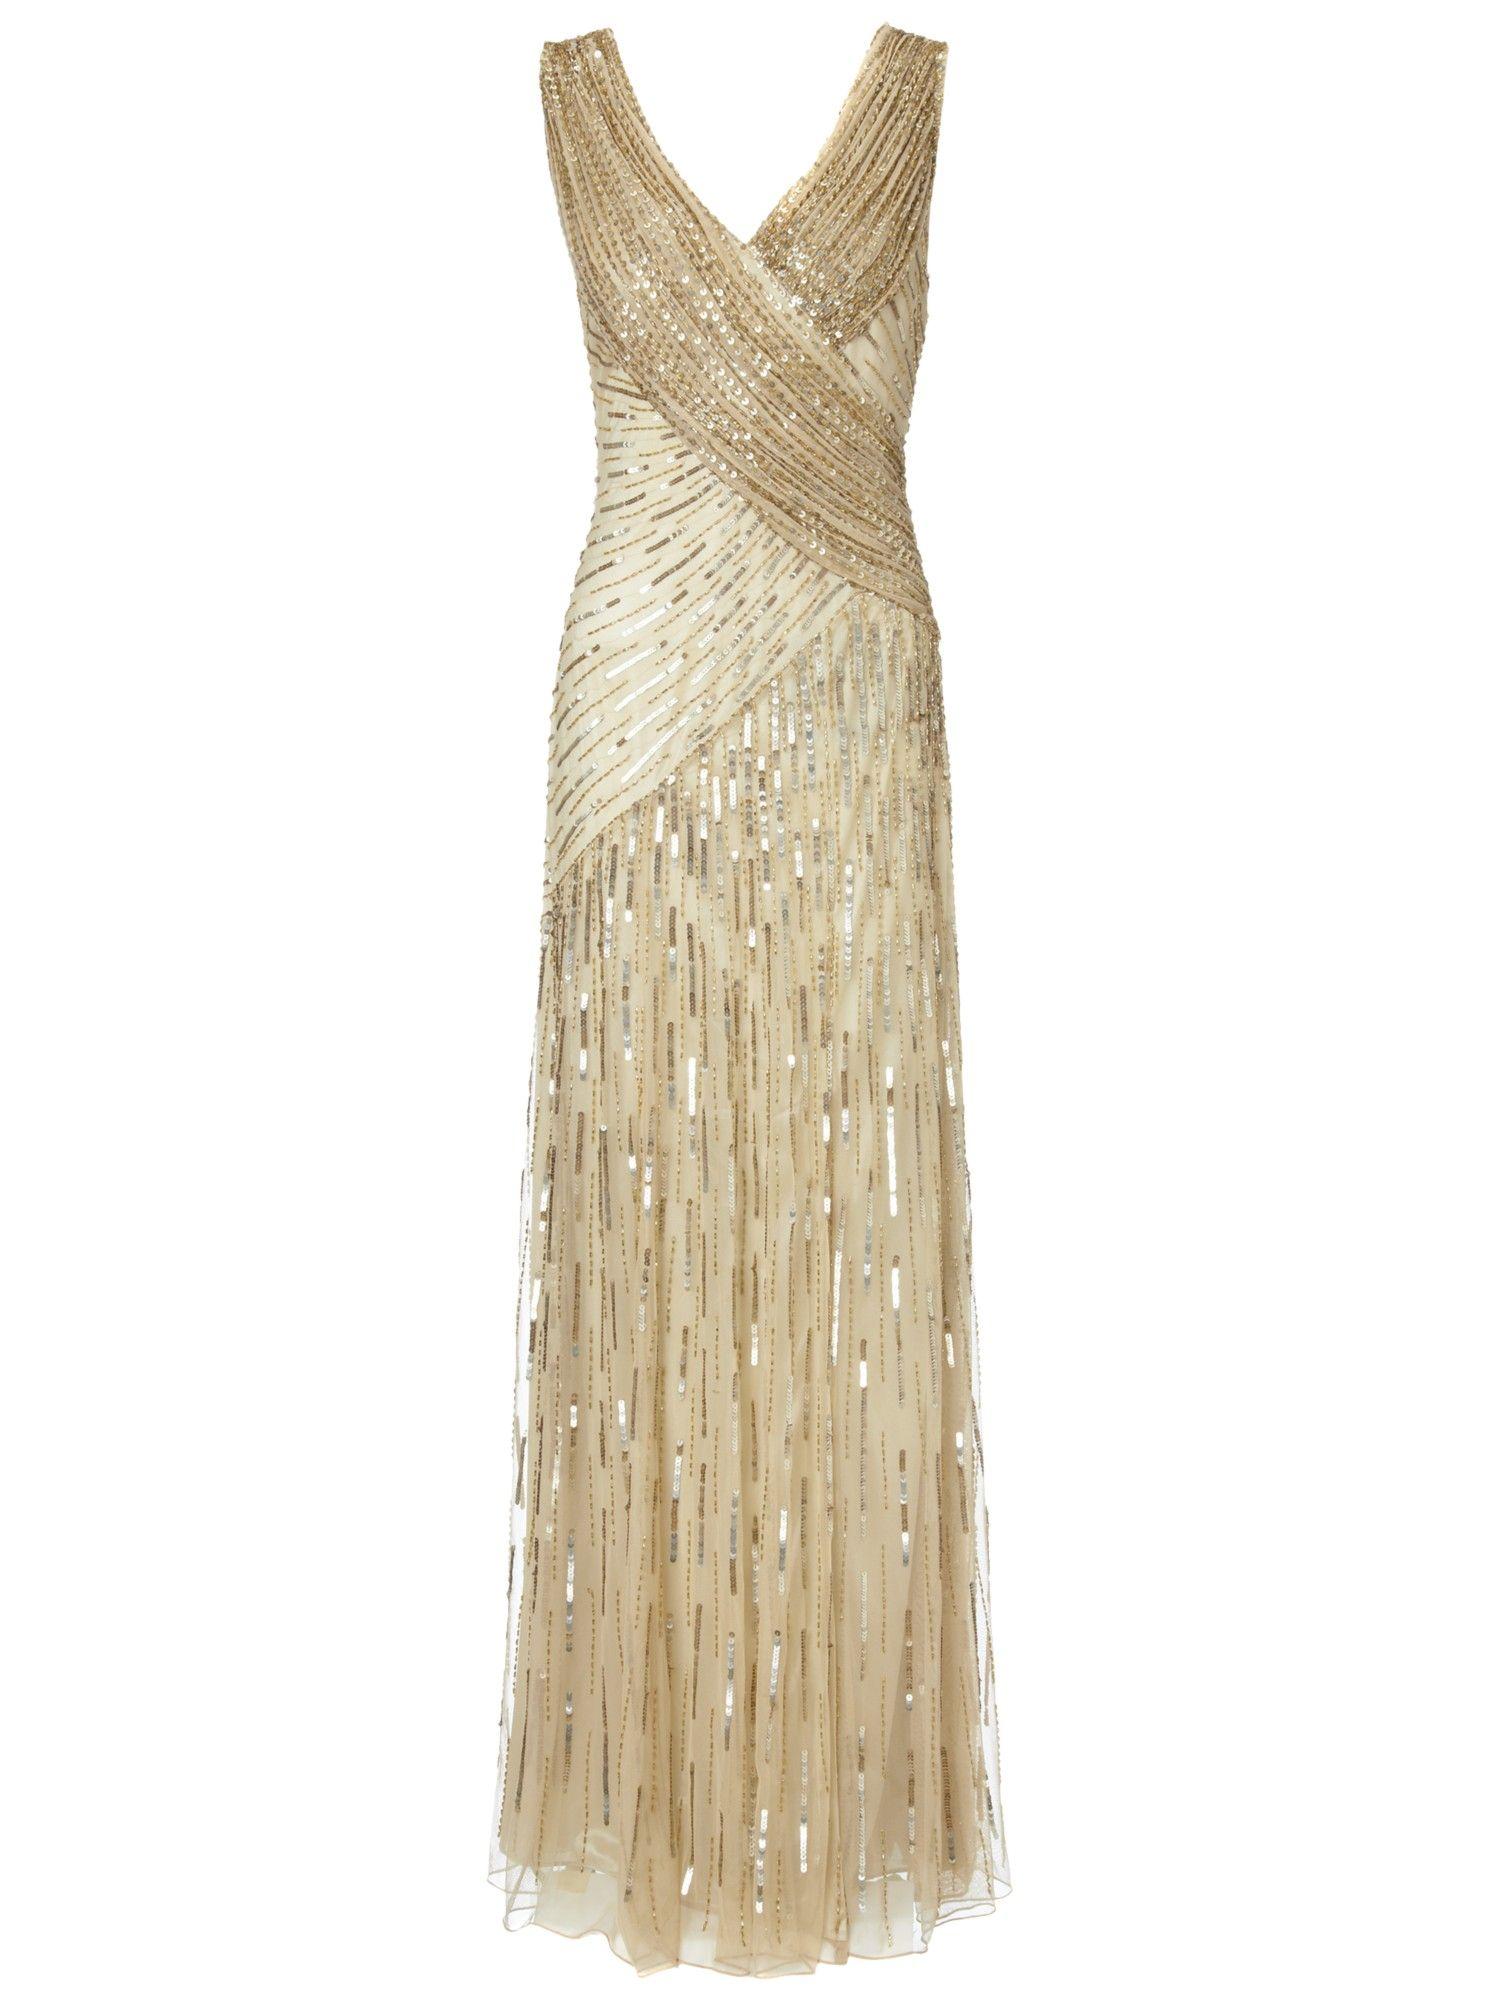 1920s Dresses Uk Flapper Gatsby Downton Abbey Dress Affordable Wedding Dresses Affordable Dresses Gold Bridesmaid Dresses [ 2000 x 1500 Pixel ]